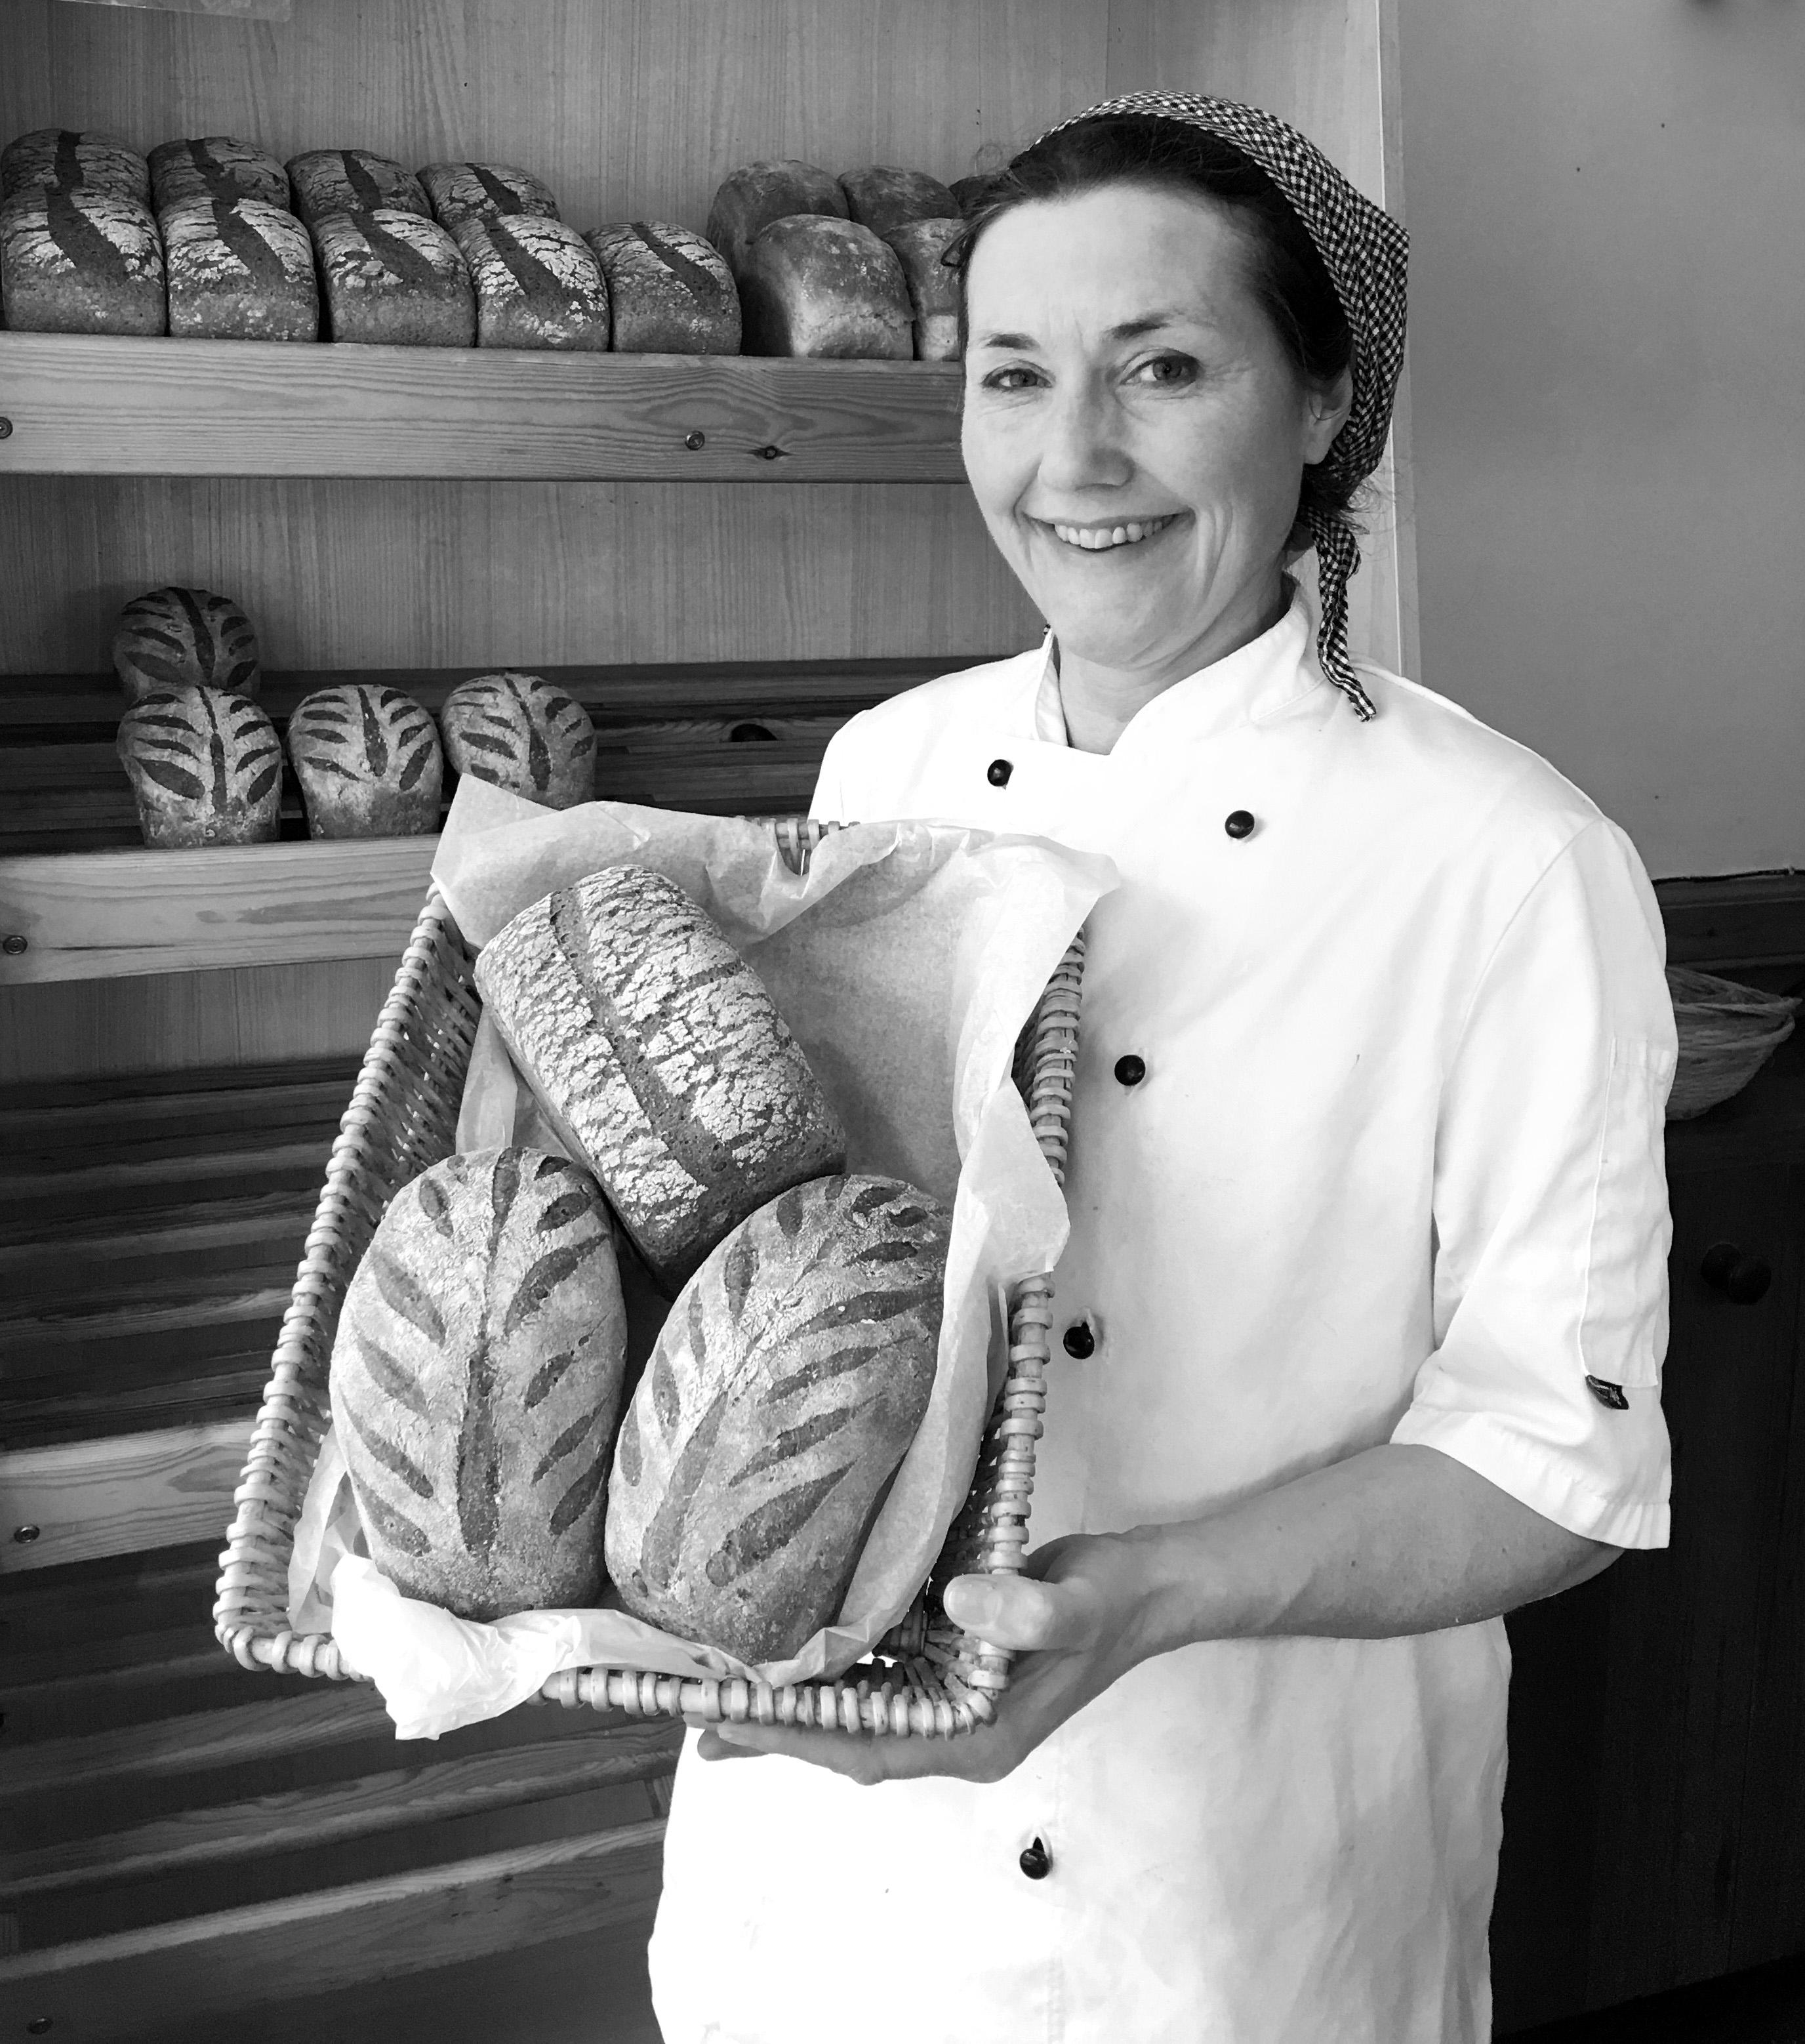 The Moody bakery, Sarah Sawyer, County Durham